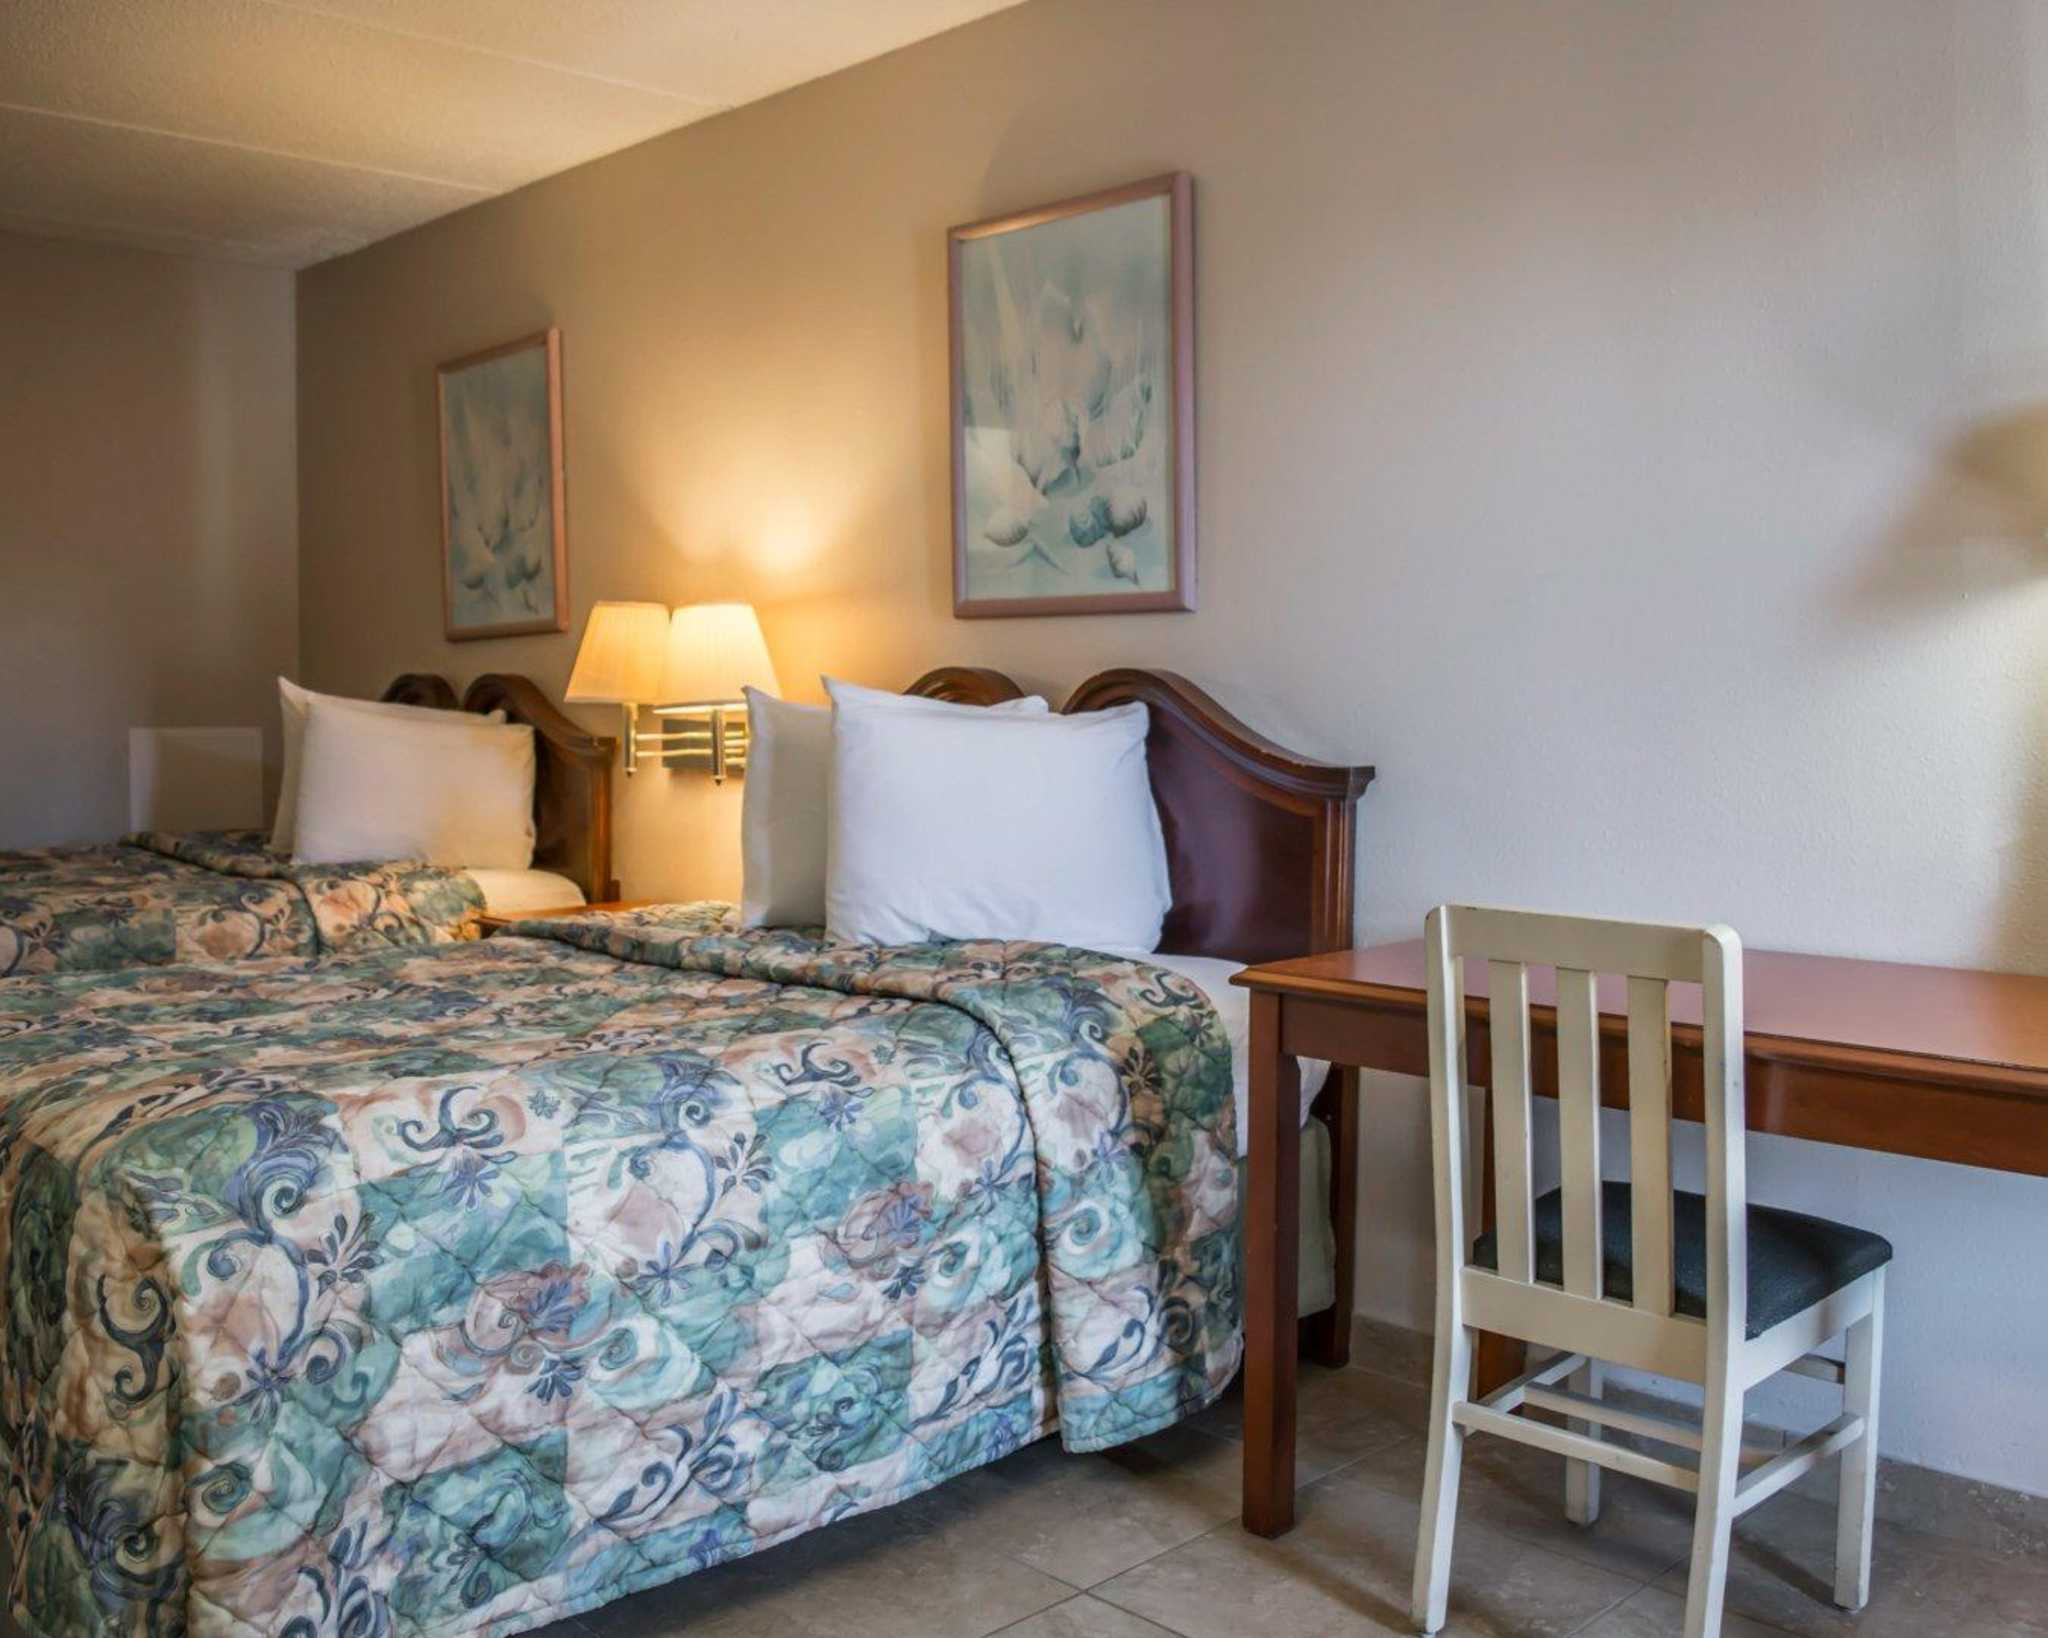 Rodeway Inn image 8